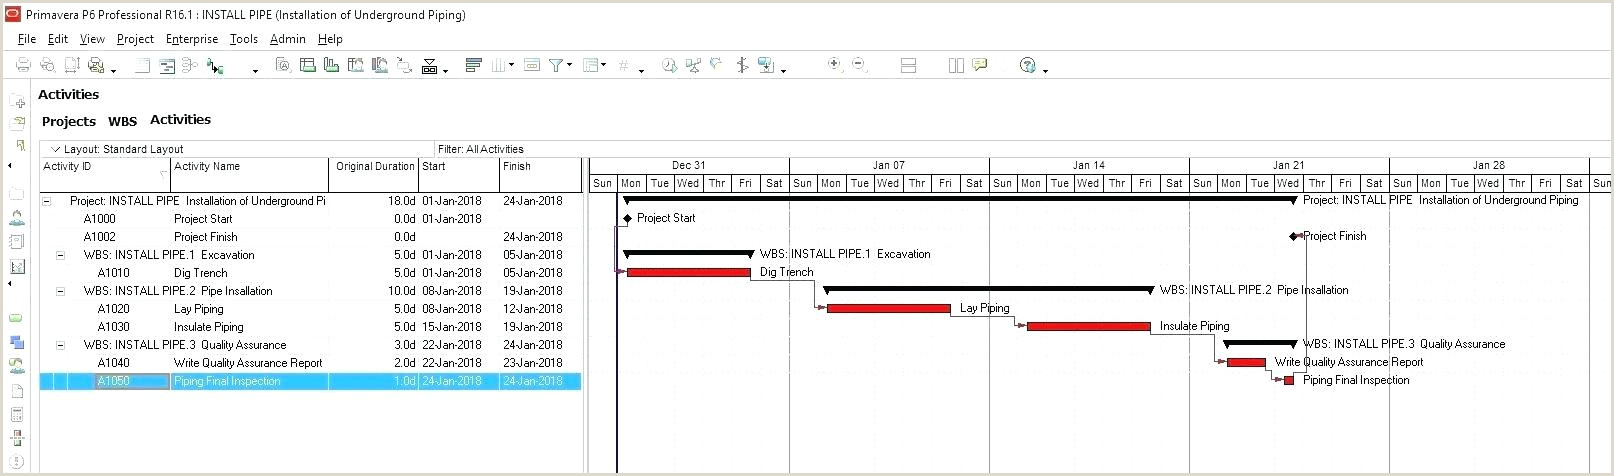 Action Plan Template Corrective Excel – sbaportal